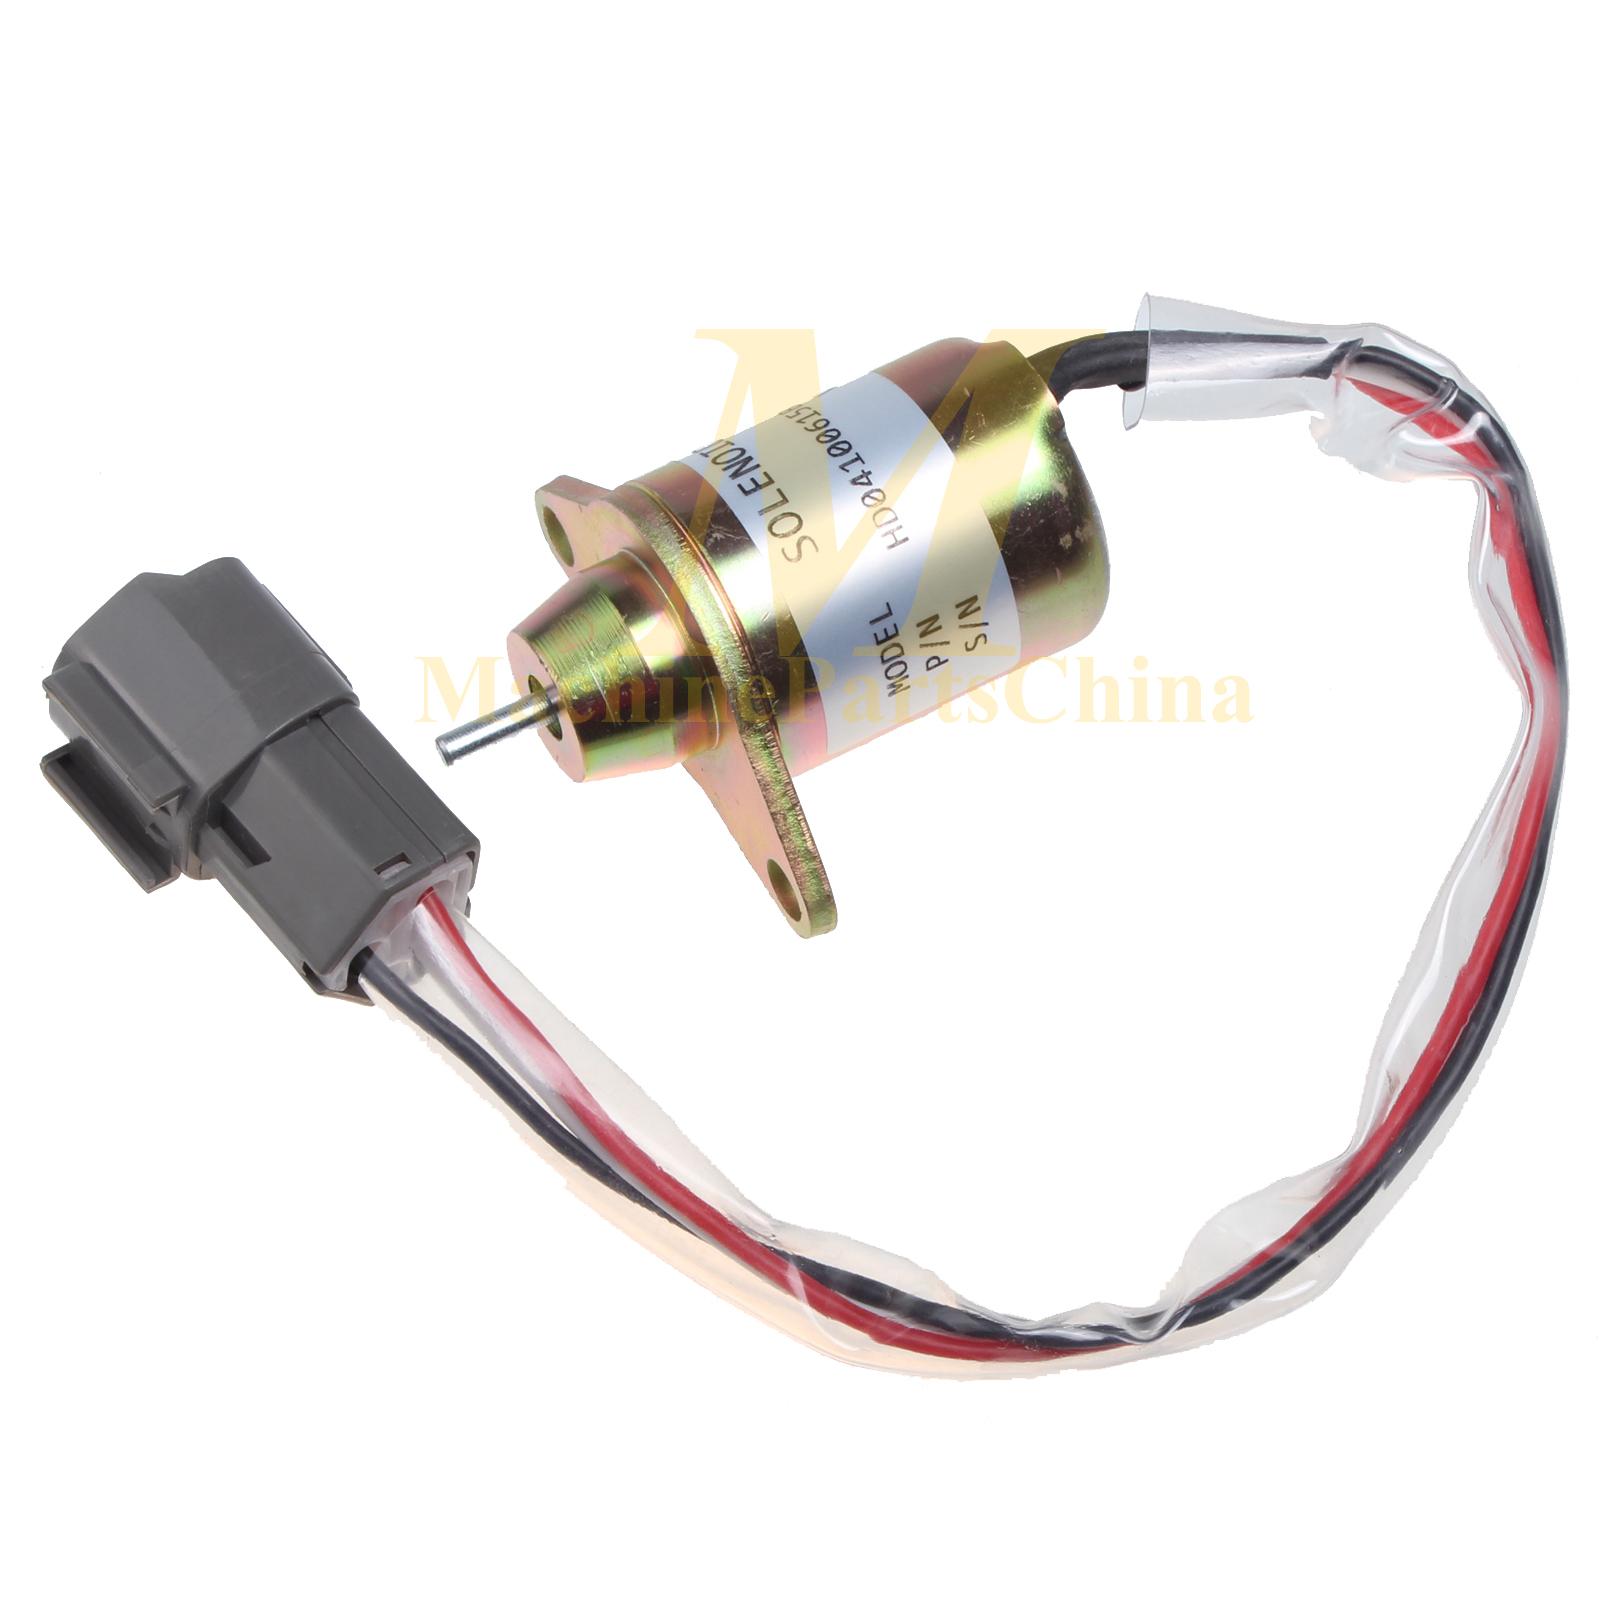 1997 dodge mins fuel shut off relay wiring generator fuel shut off solenoid wiring fuel shut off solenoid 119233-77932 fits yanmar john deere ...